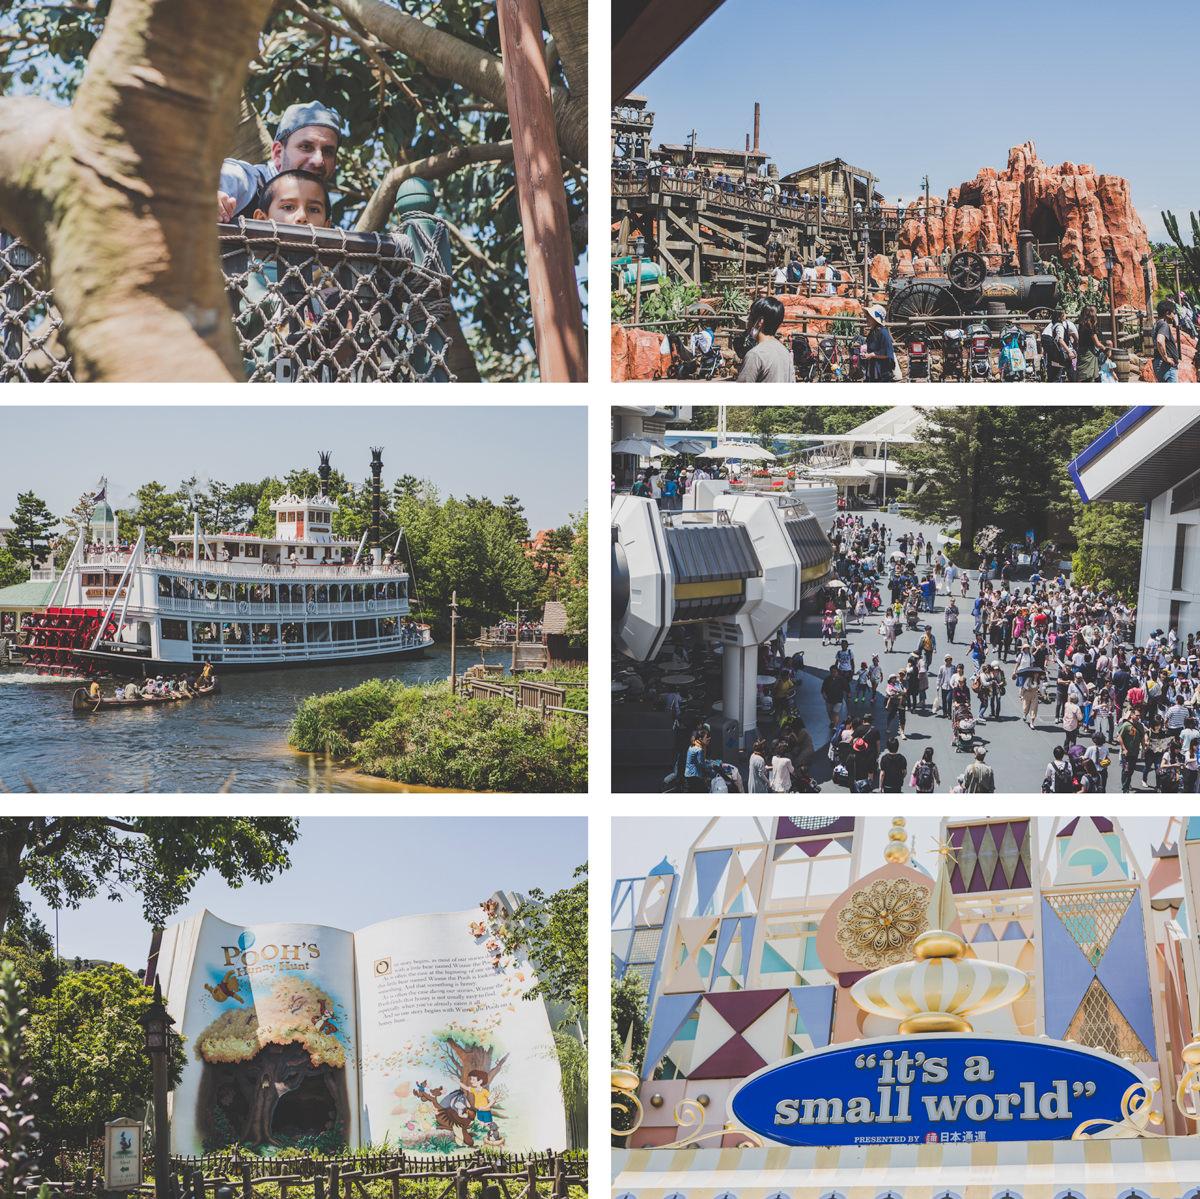 Disneyland photos - Tokyo Disneyland adventure